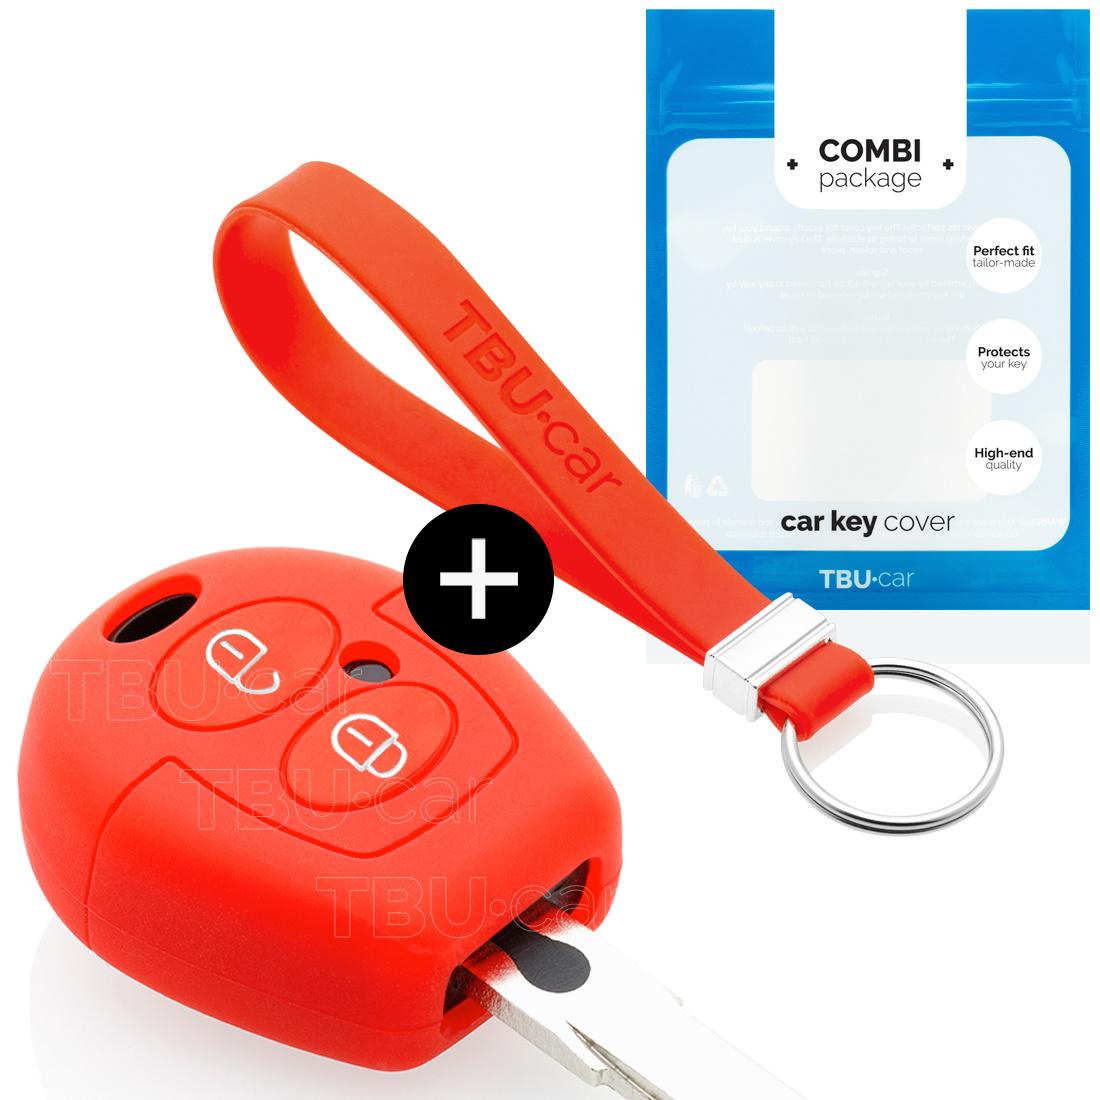 TBU car Autoschlüssel Hülle für Seat 2 Tasten - Schutzhülle aus Silikon - Auto Schlüsselhülle Cover in Rot